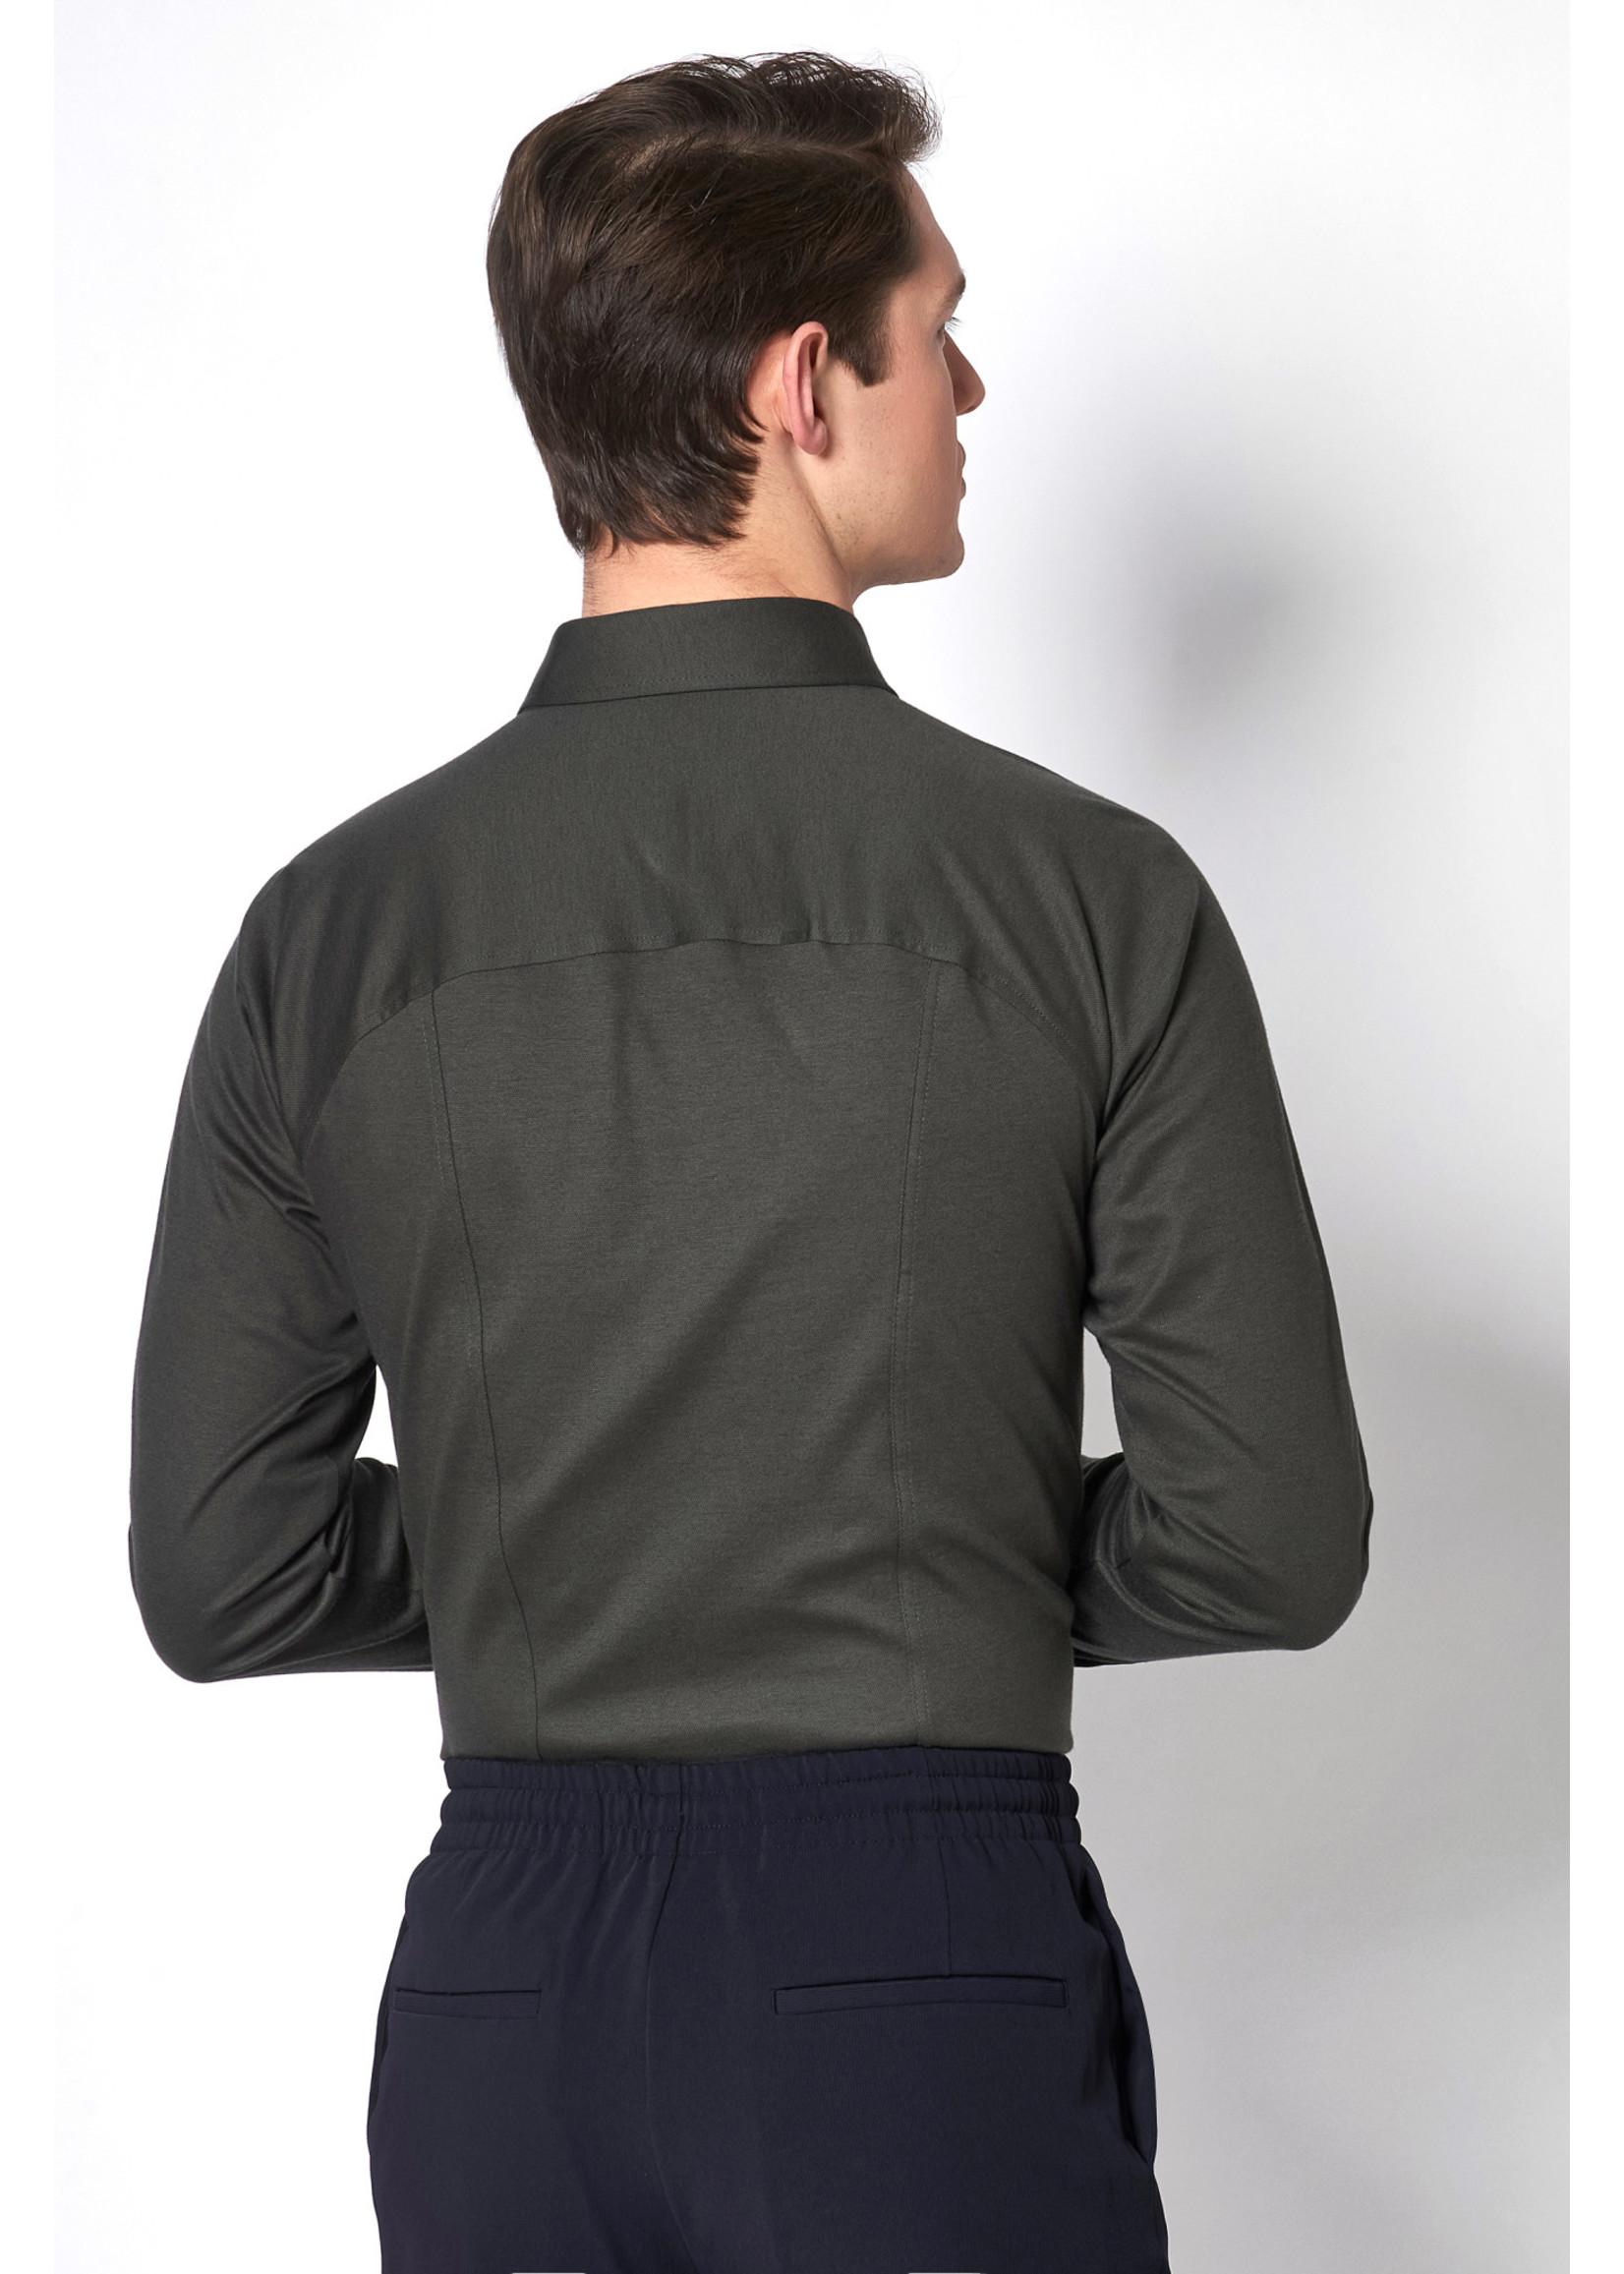 Desoto jersey overhemd groen